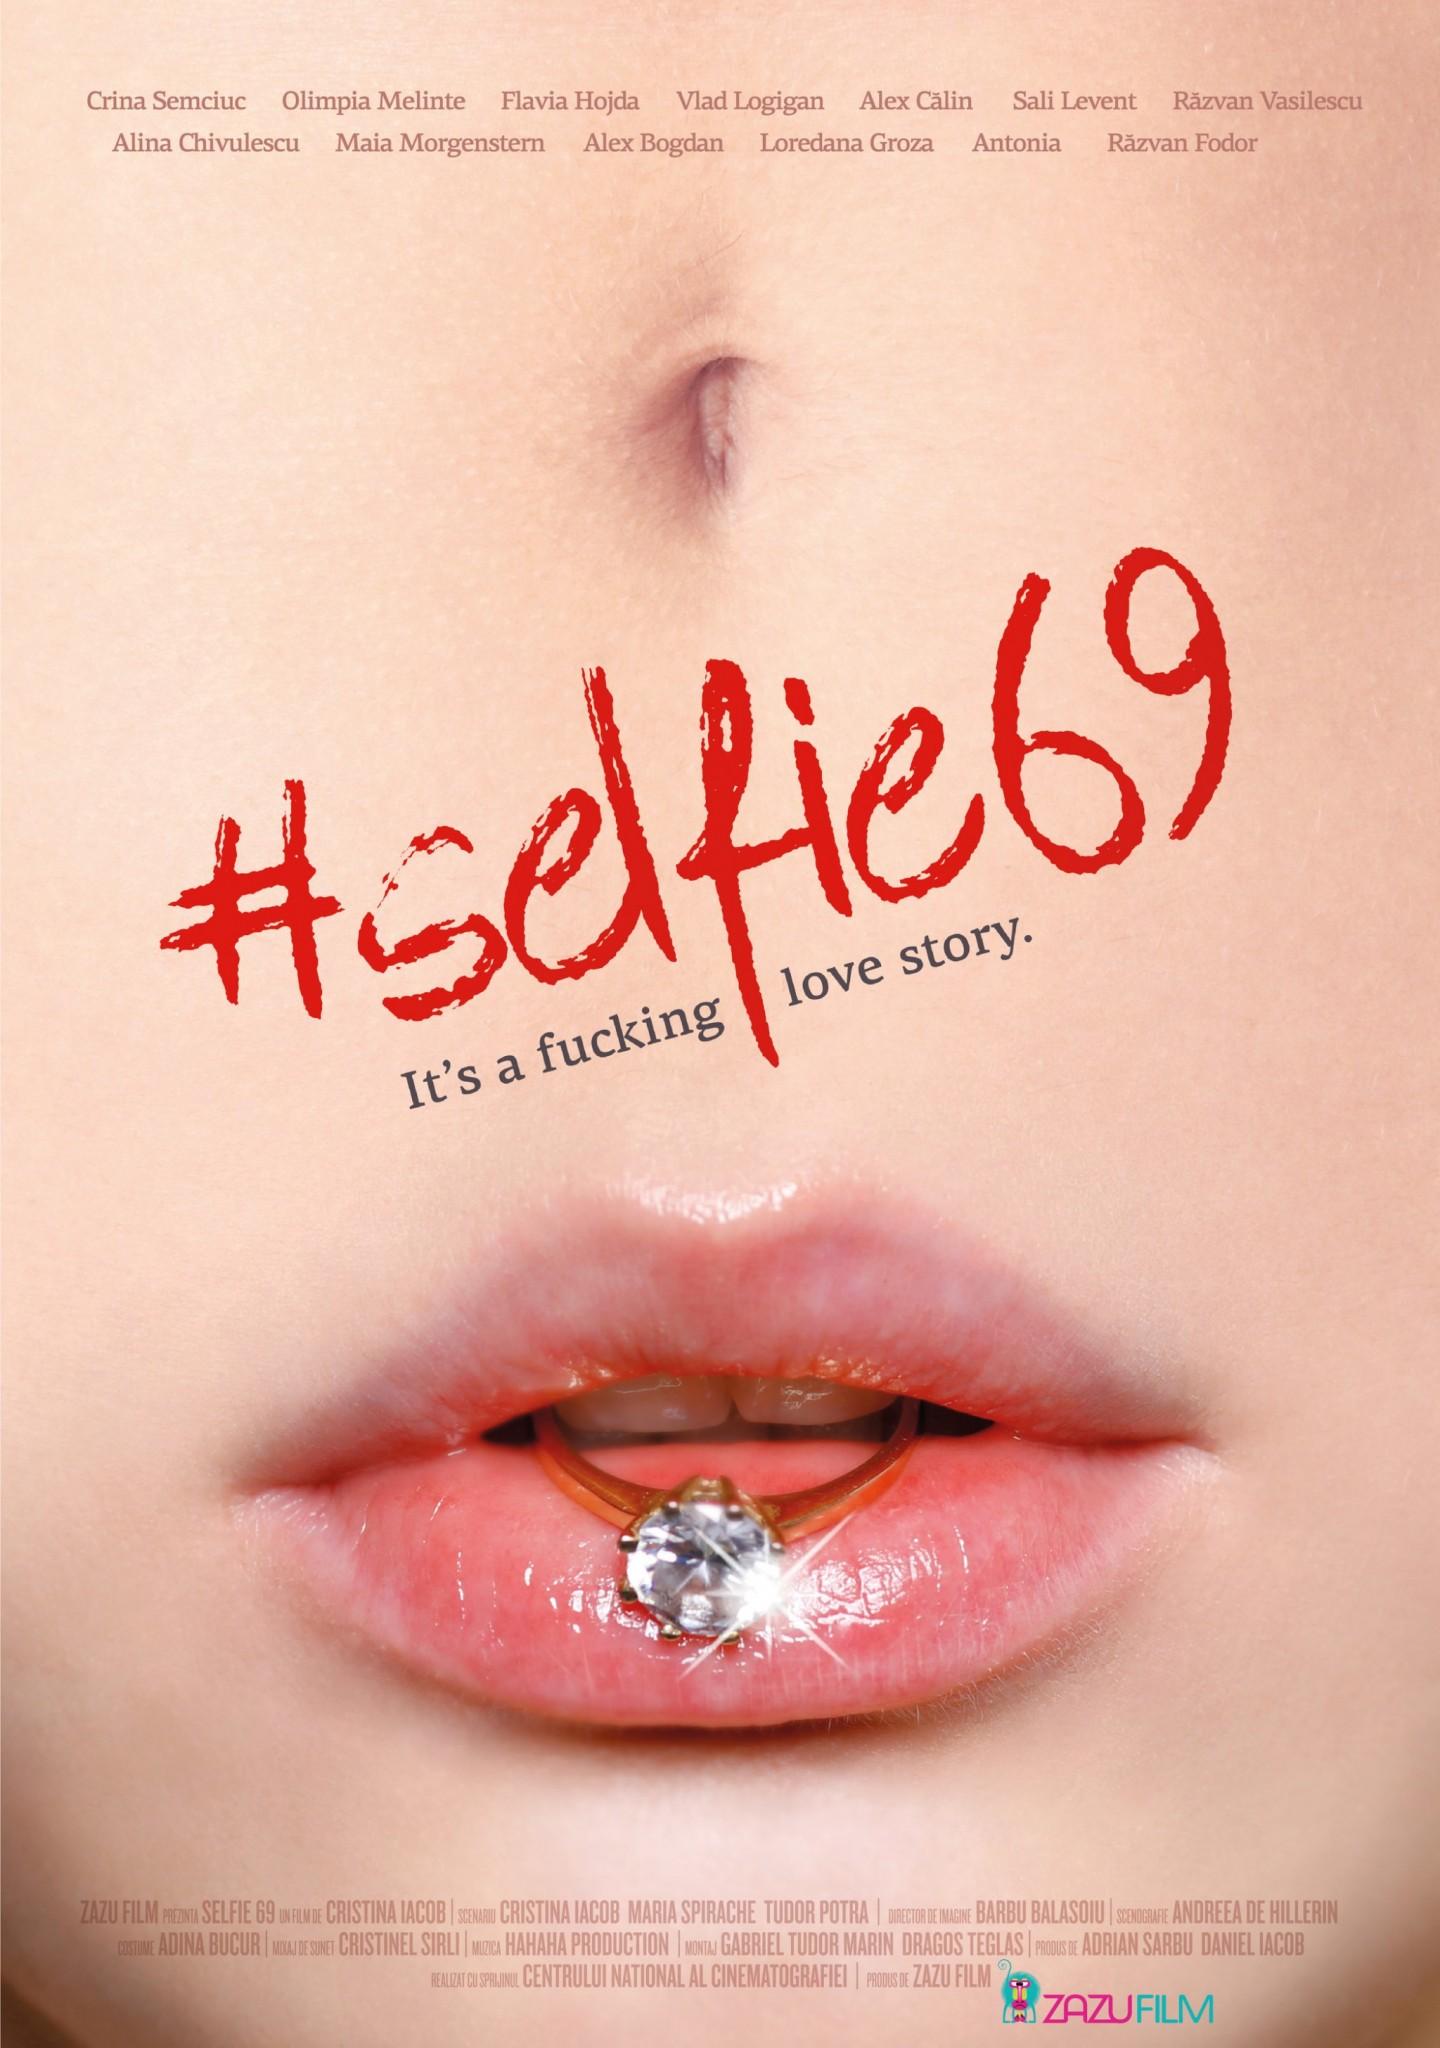 selfie69-film-septembrie-fabulous_muses_film_romanesc_cristina_jacob